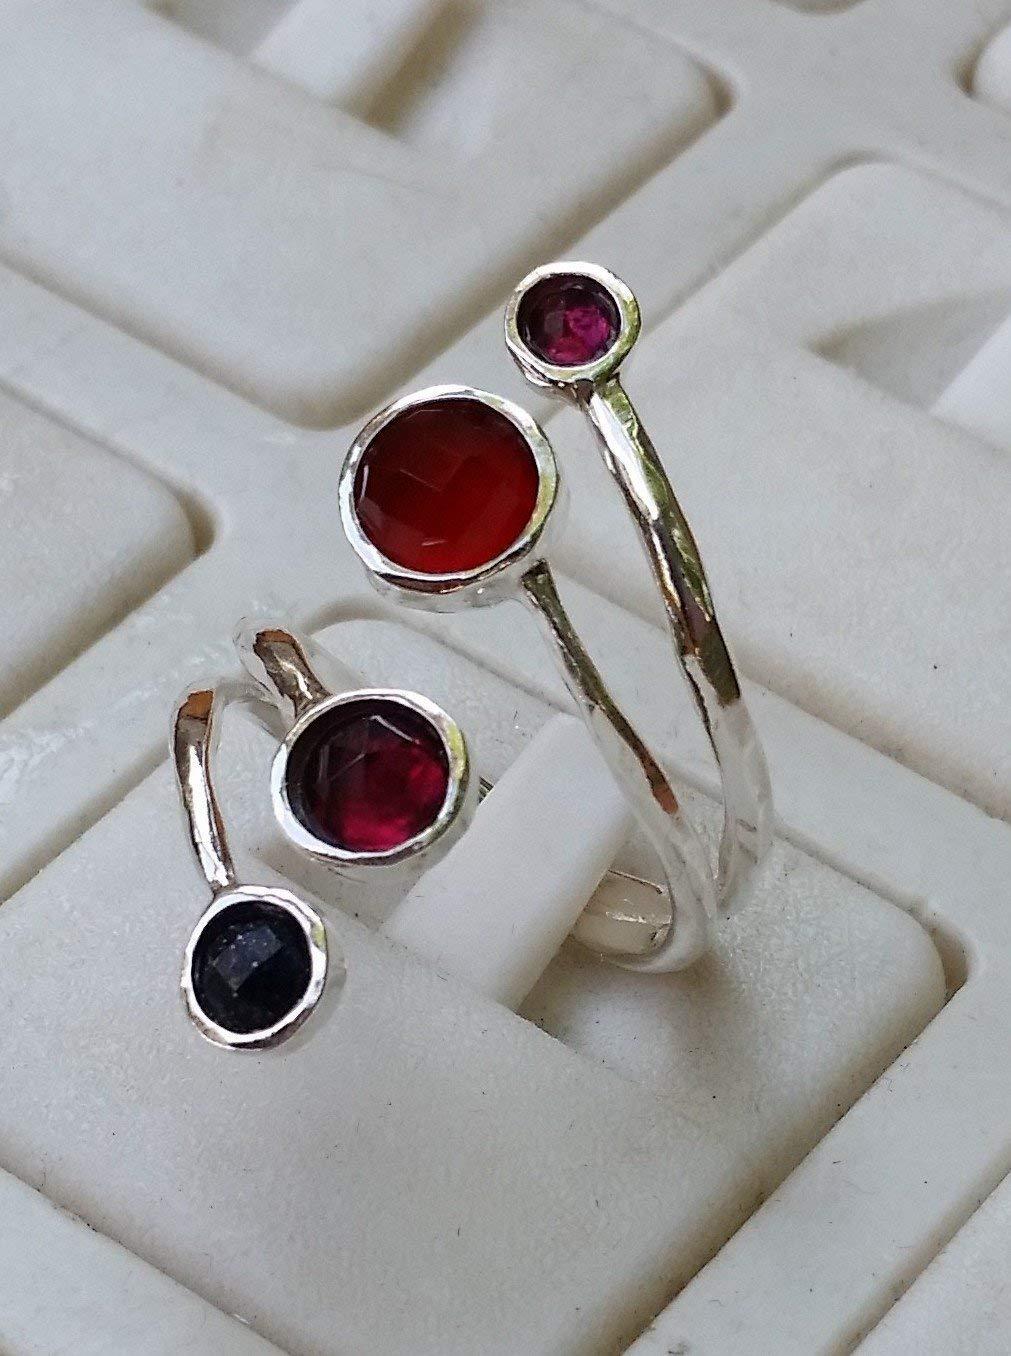 Garnet Silver Ring , Agate Ring, Sterling Silver 925 Ring, Gemstones Ring, Handmade Multistones Ring, Stackable Ring, Open Silver Ring, Statement Silver Ring, Onyx Ring